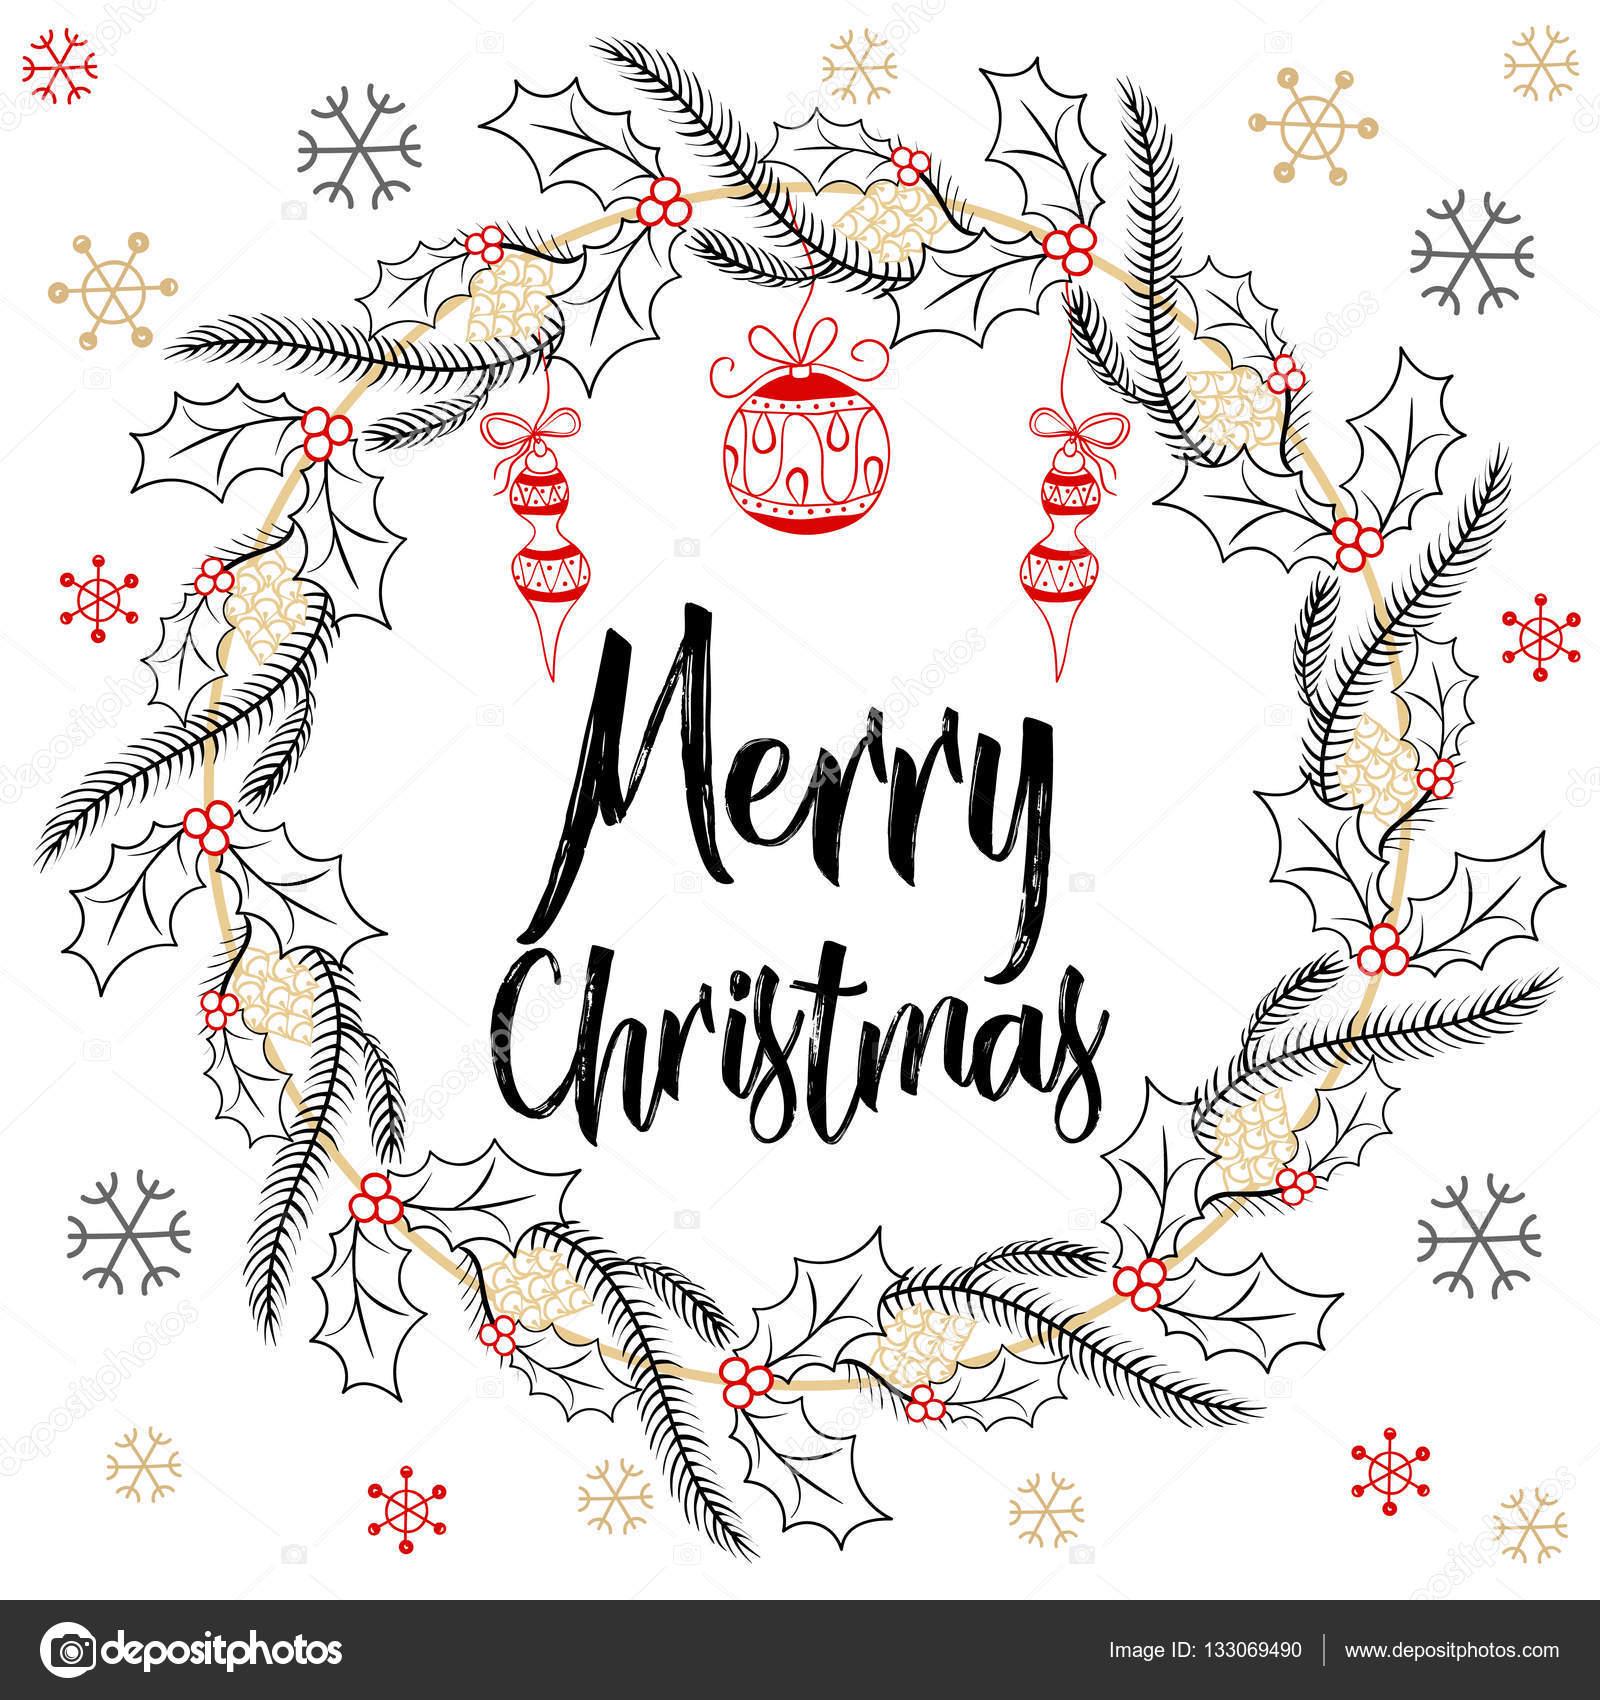 Holidays modern calligraphy merry christmas hand drawn